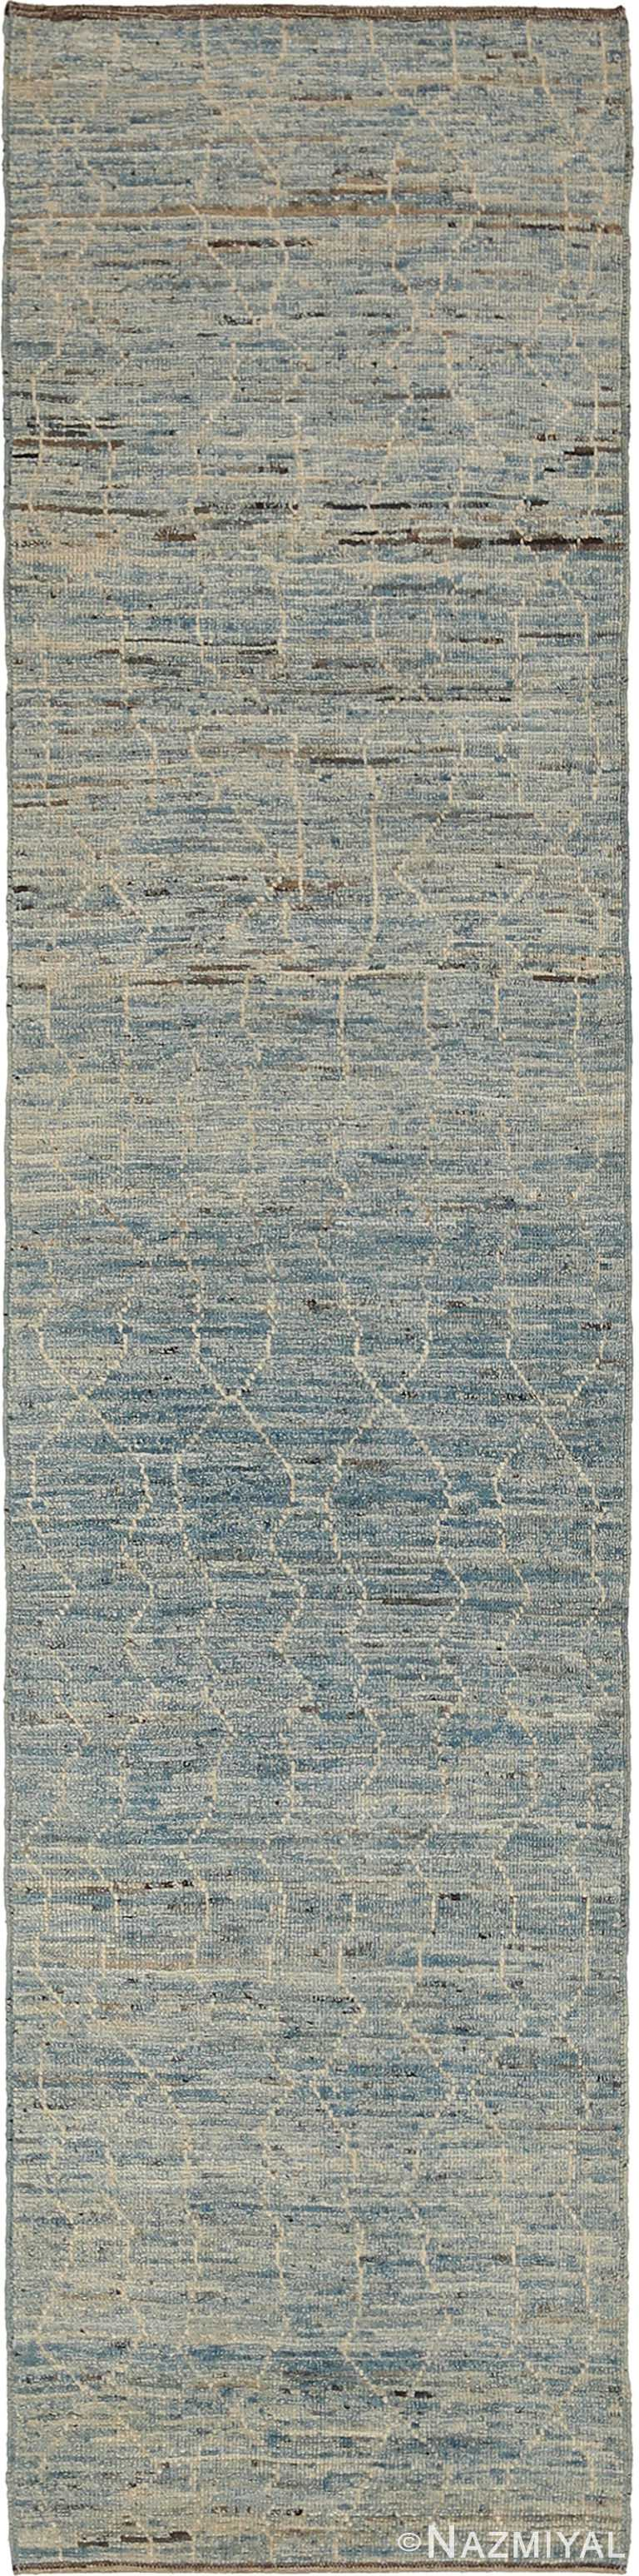 Soft Grey Blue Modern Moroccan Style Runner Rug 60323 by Nazmiyal